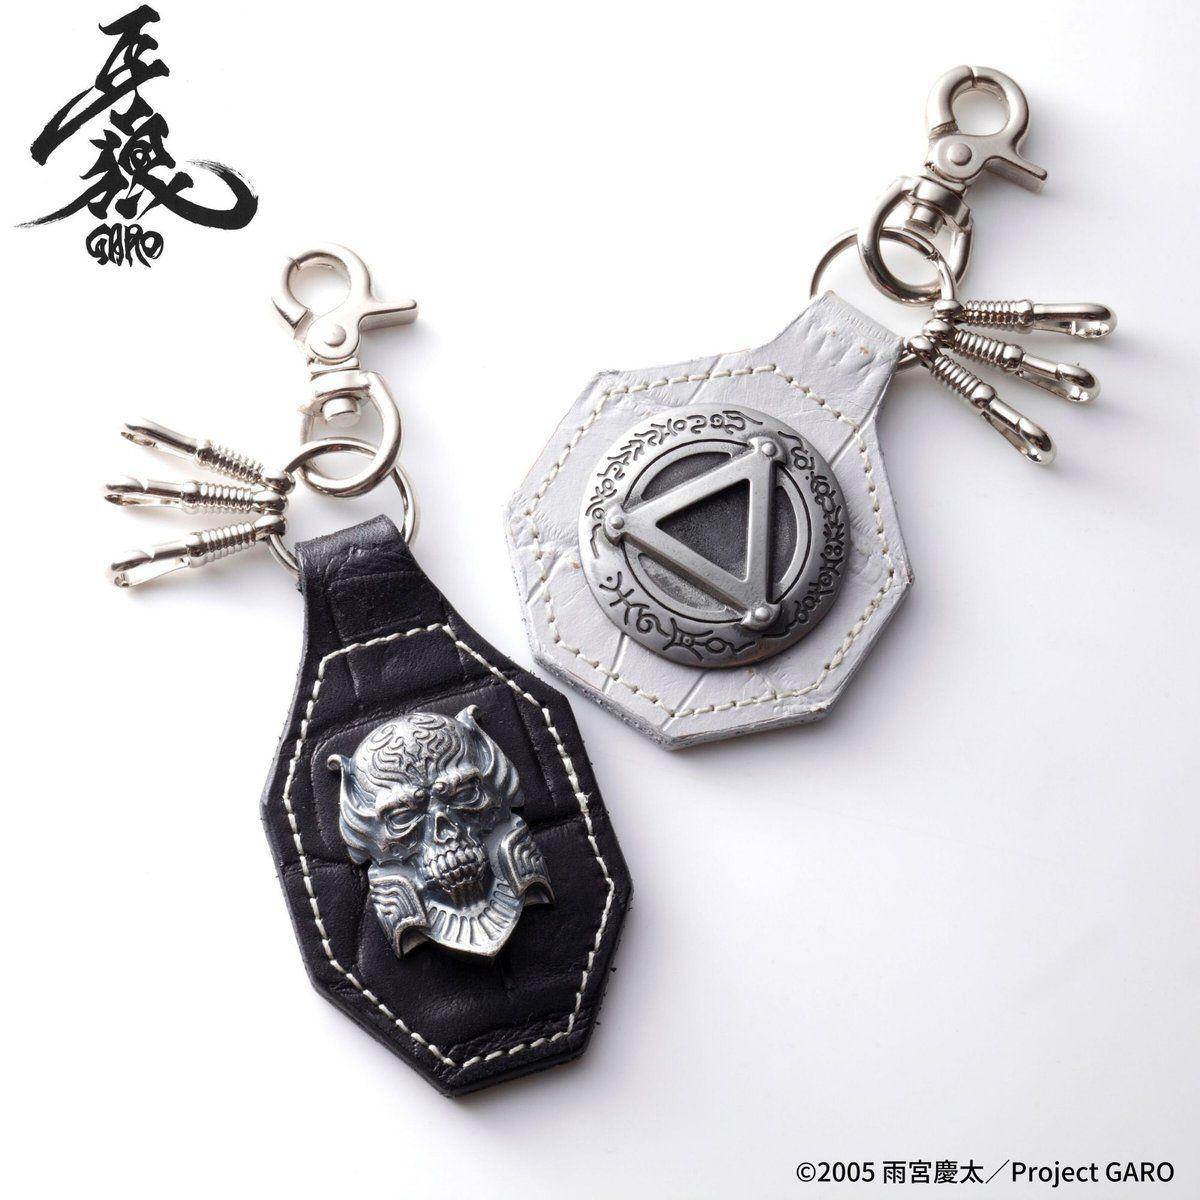 Leather Keychain—GARO